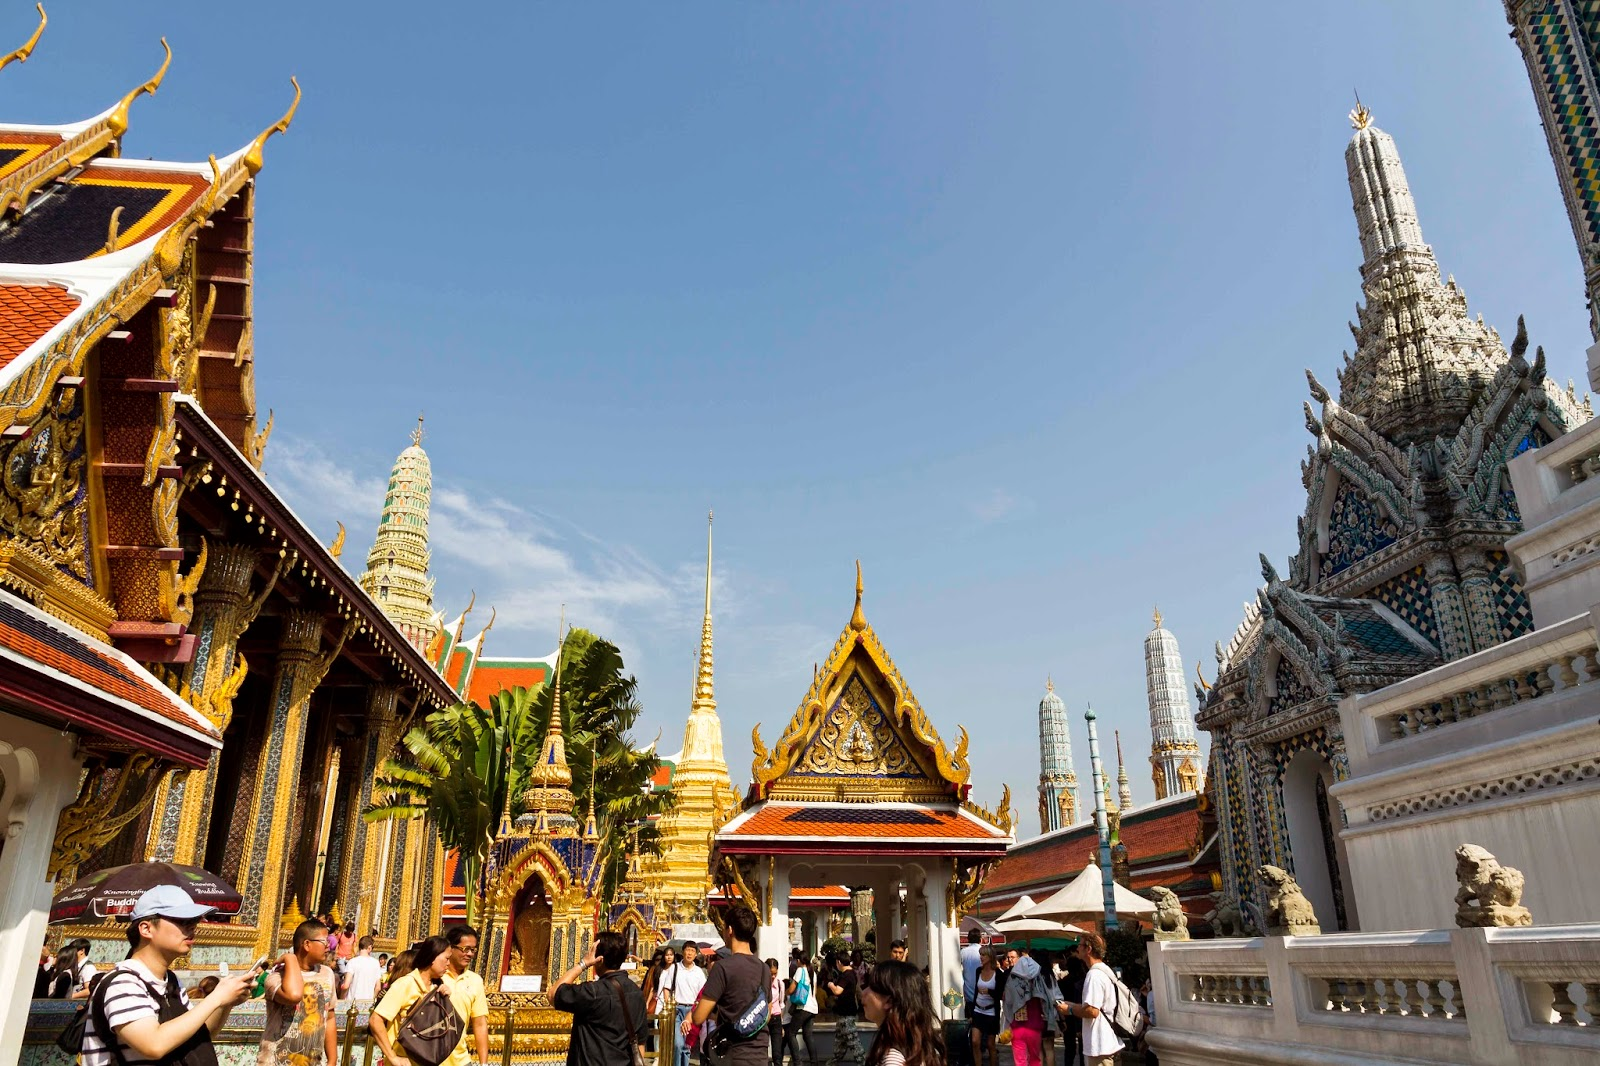 http://www.dreamstime.com/editorial-photo-grand-palace-bangkok-emerald-buddha-temple-thailand-image49056476